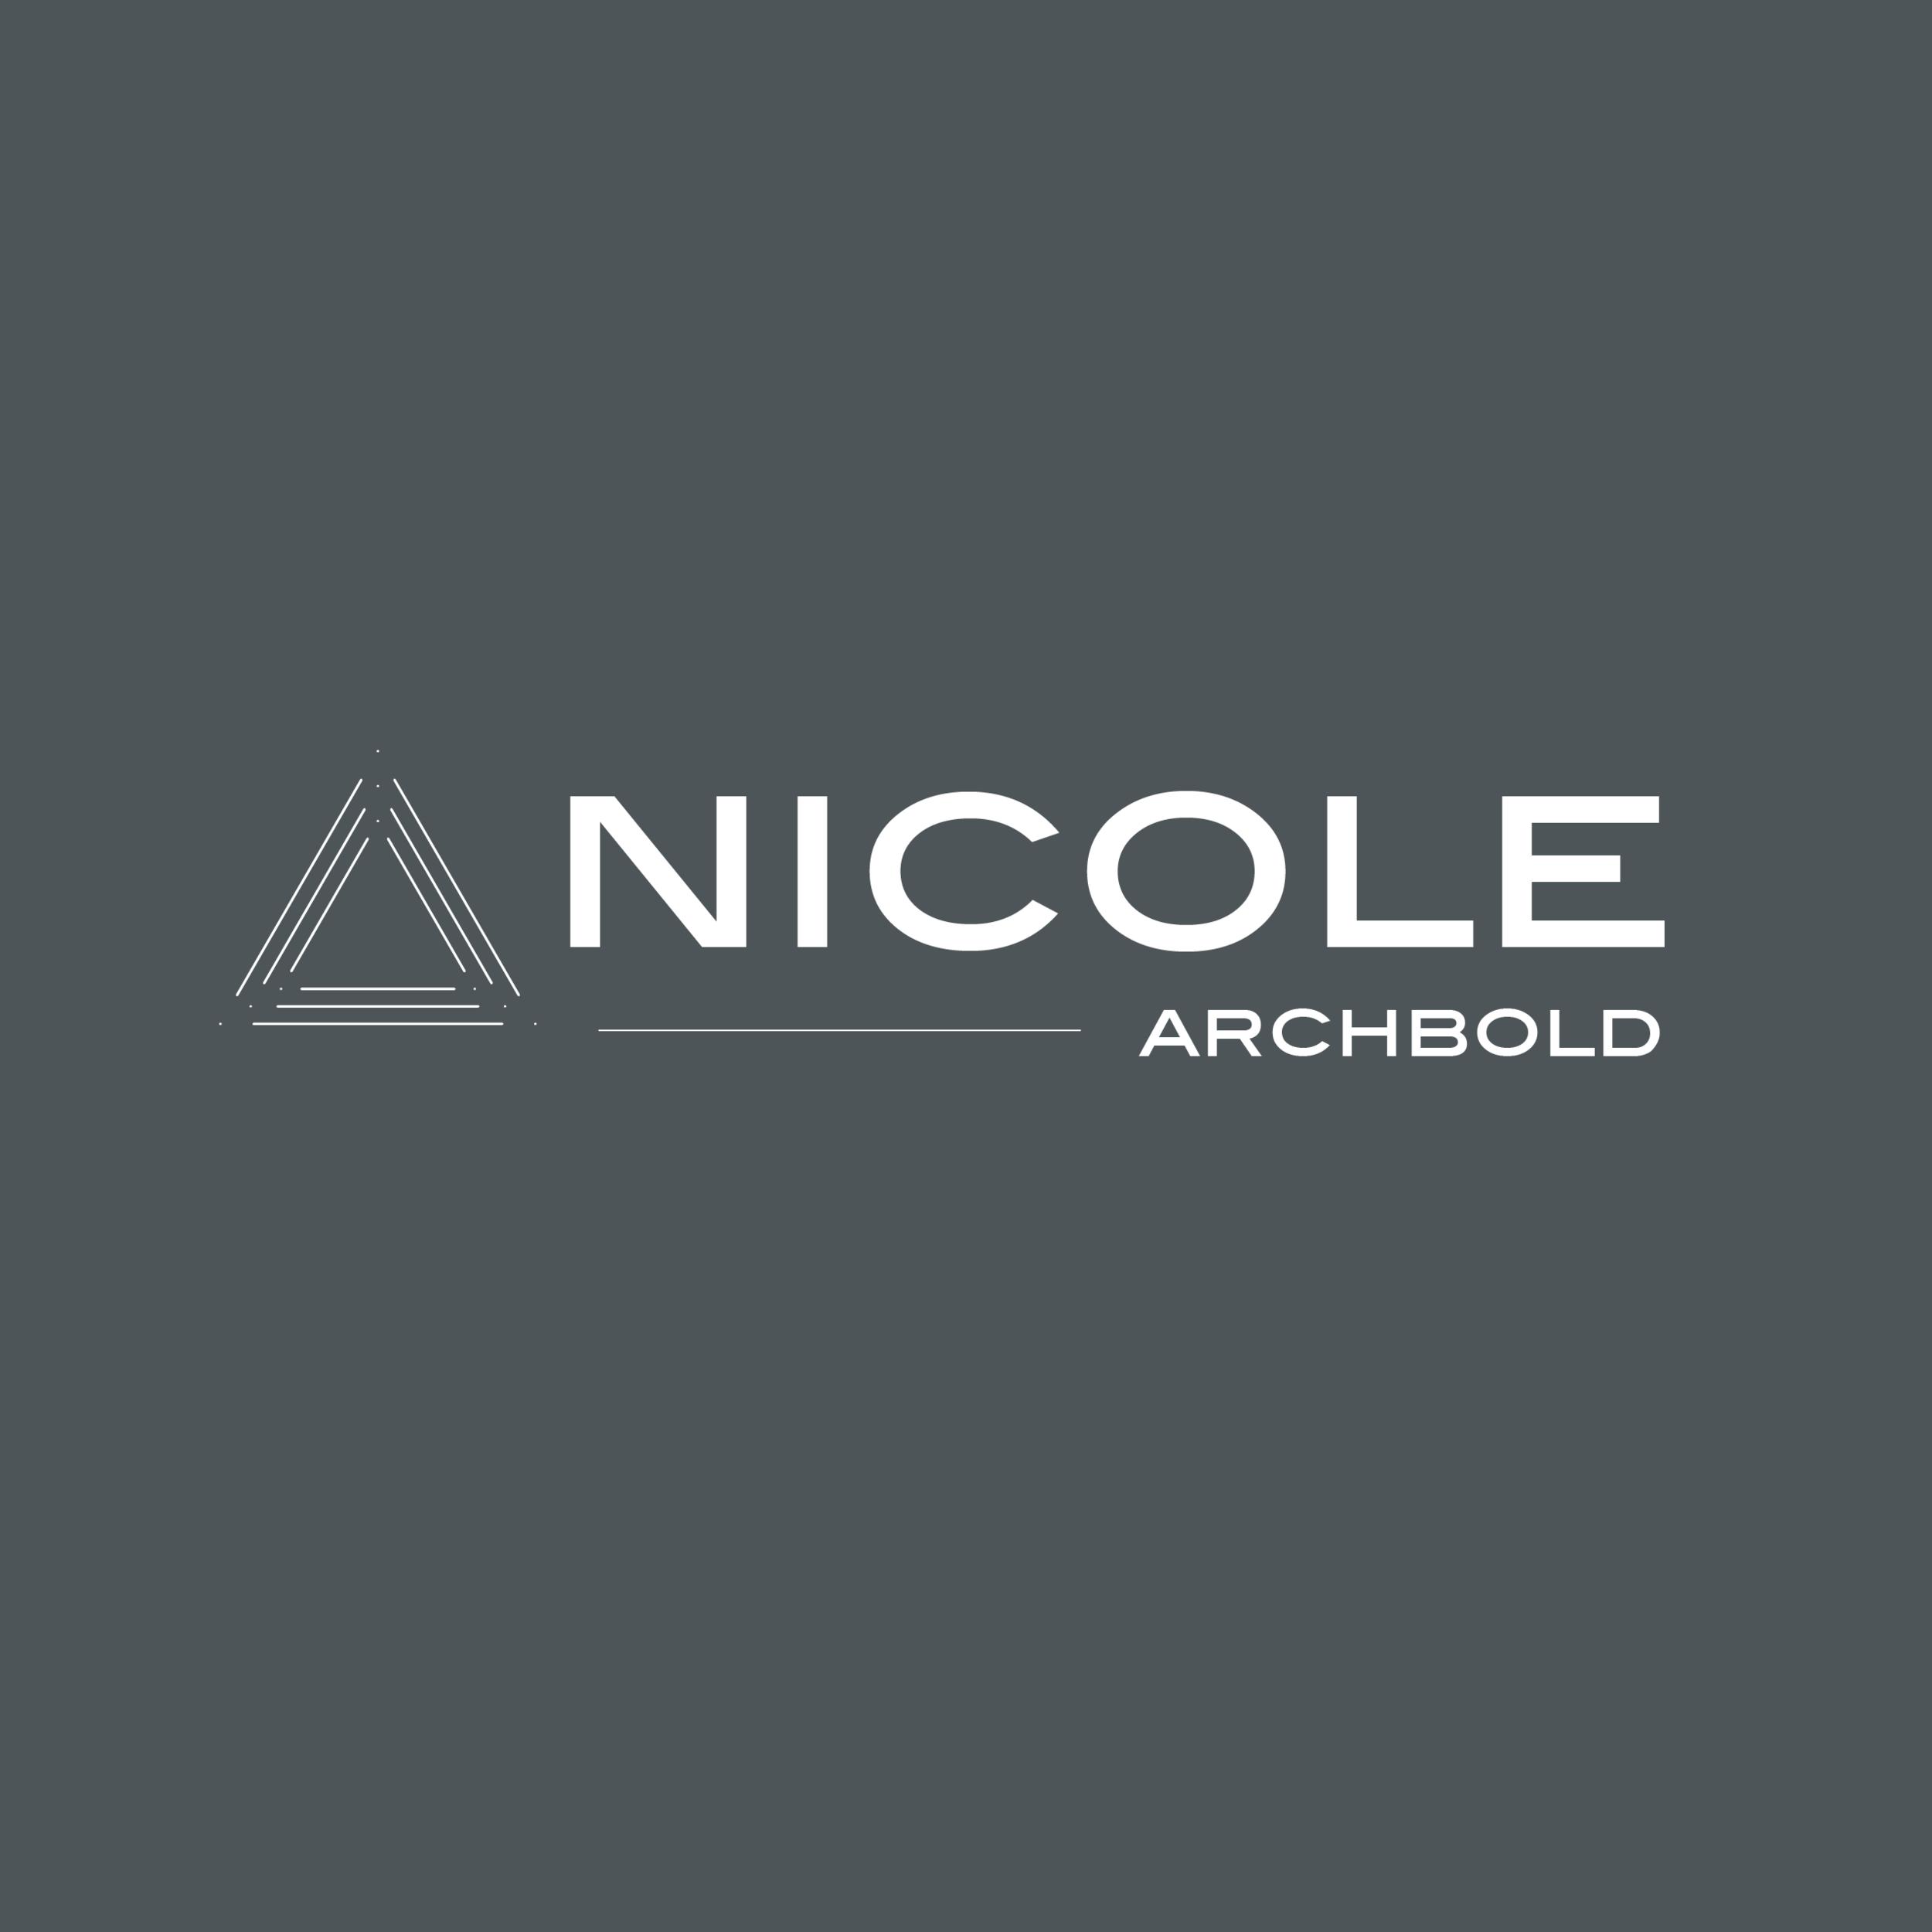 nicole_archbold_logo-01.png